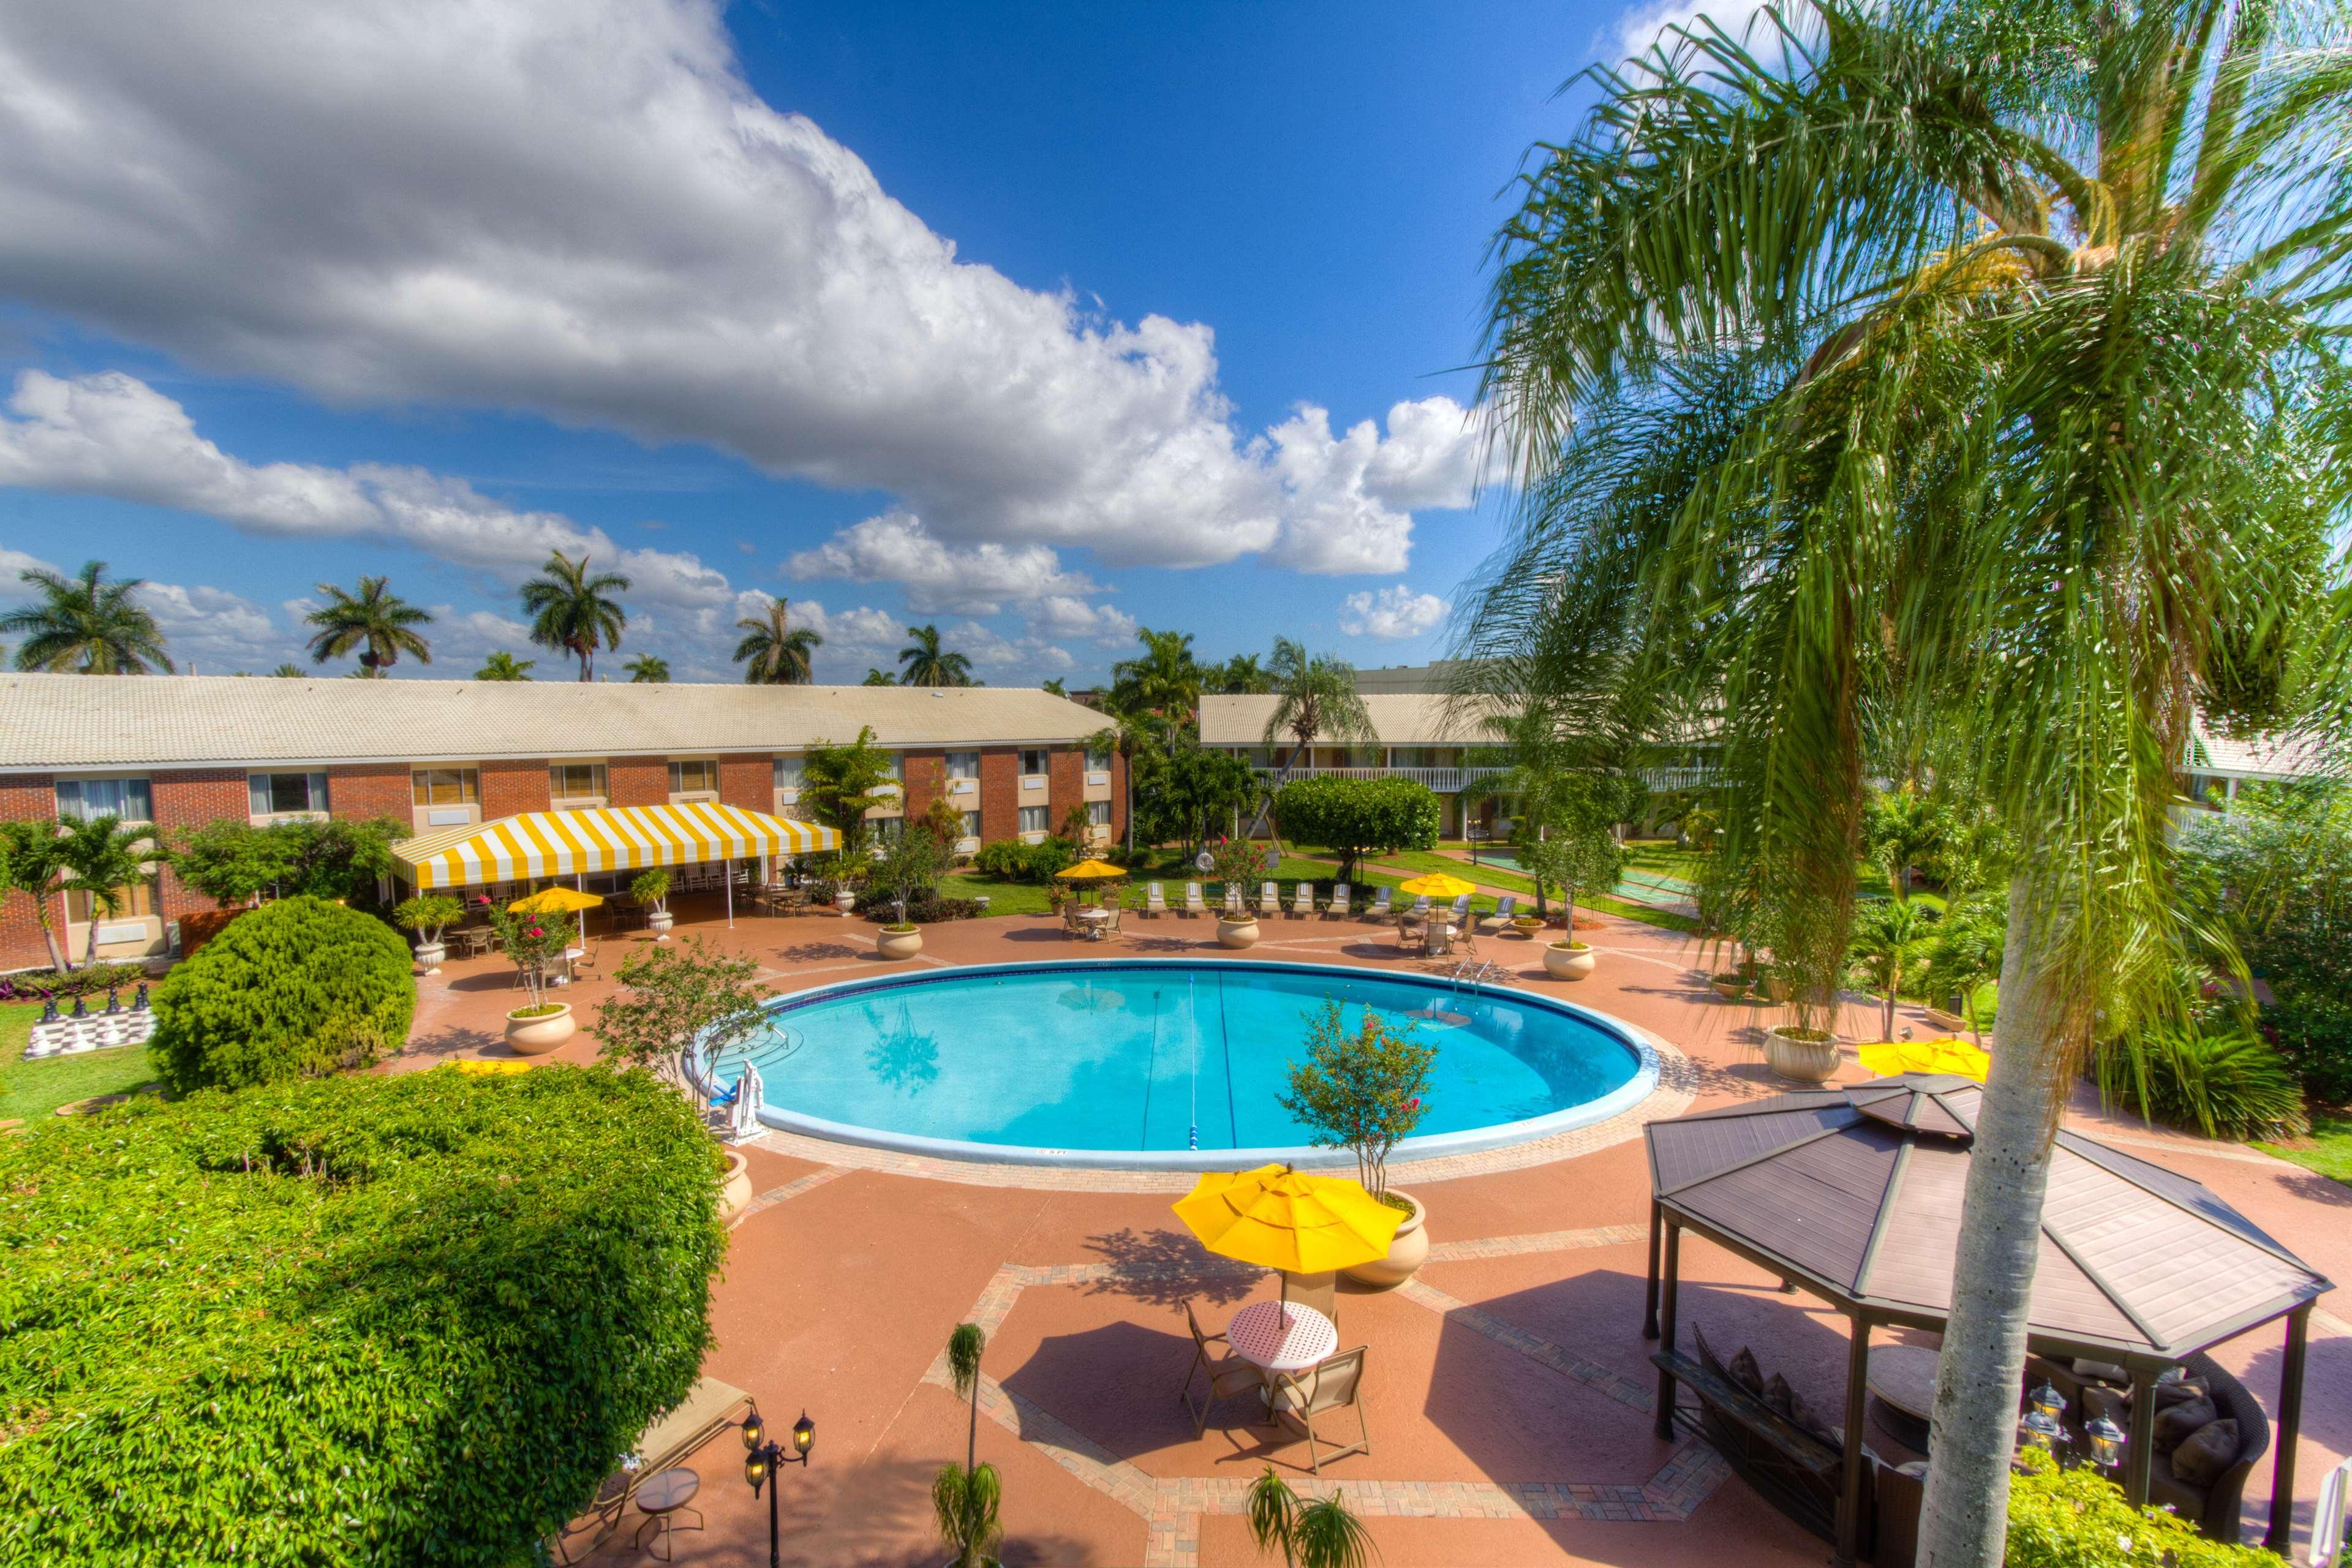 Hawthorn Suites Palm Beach Lakes Blvd